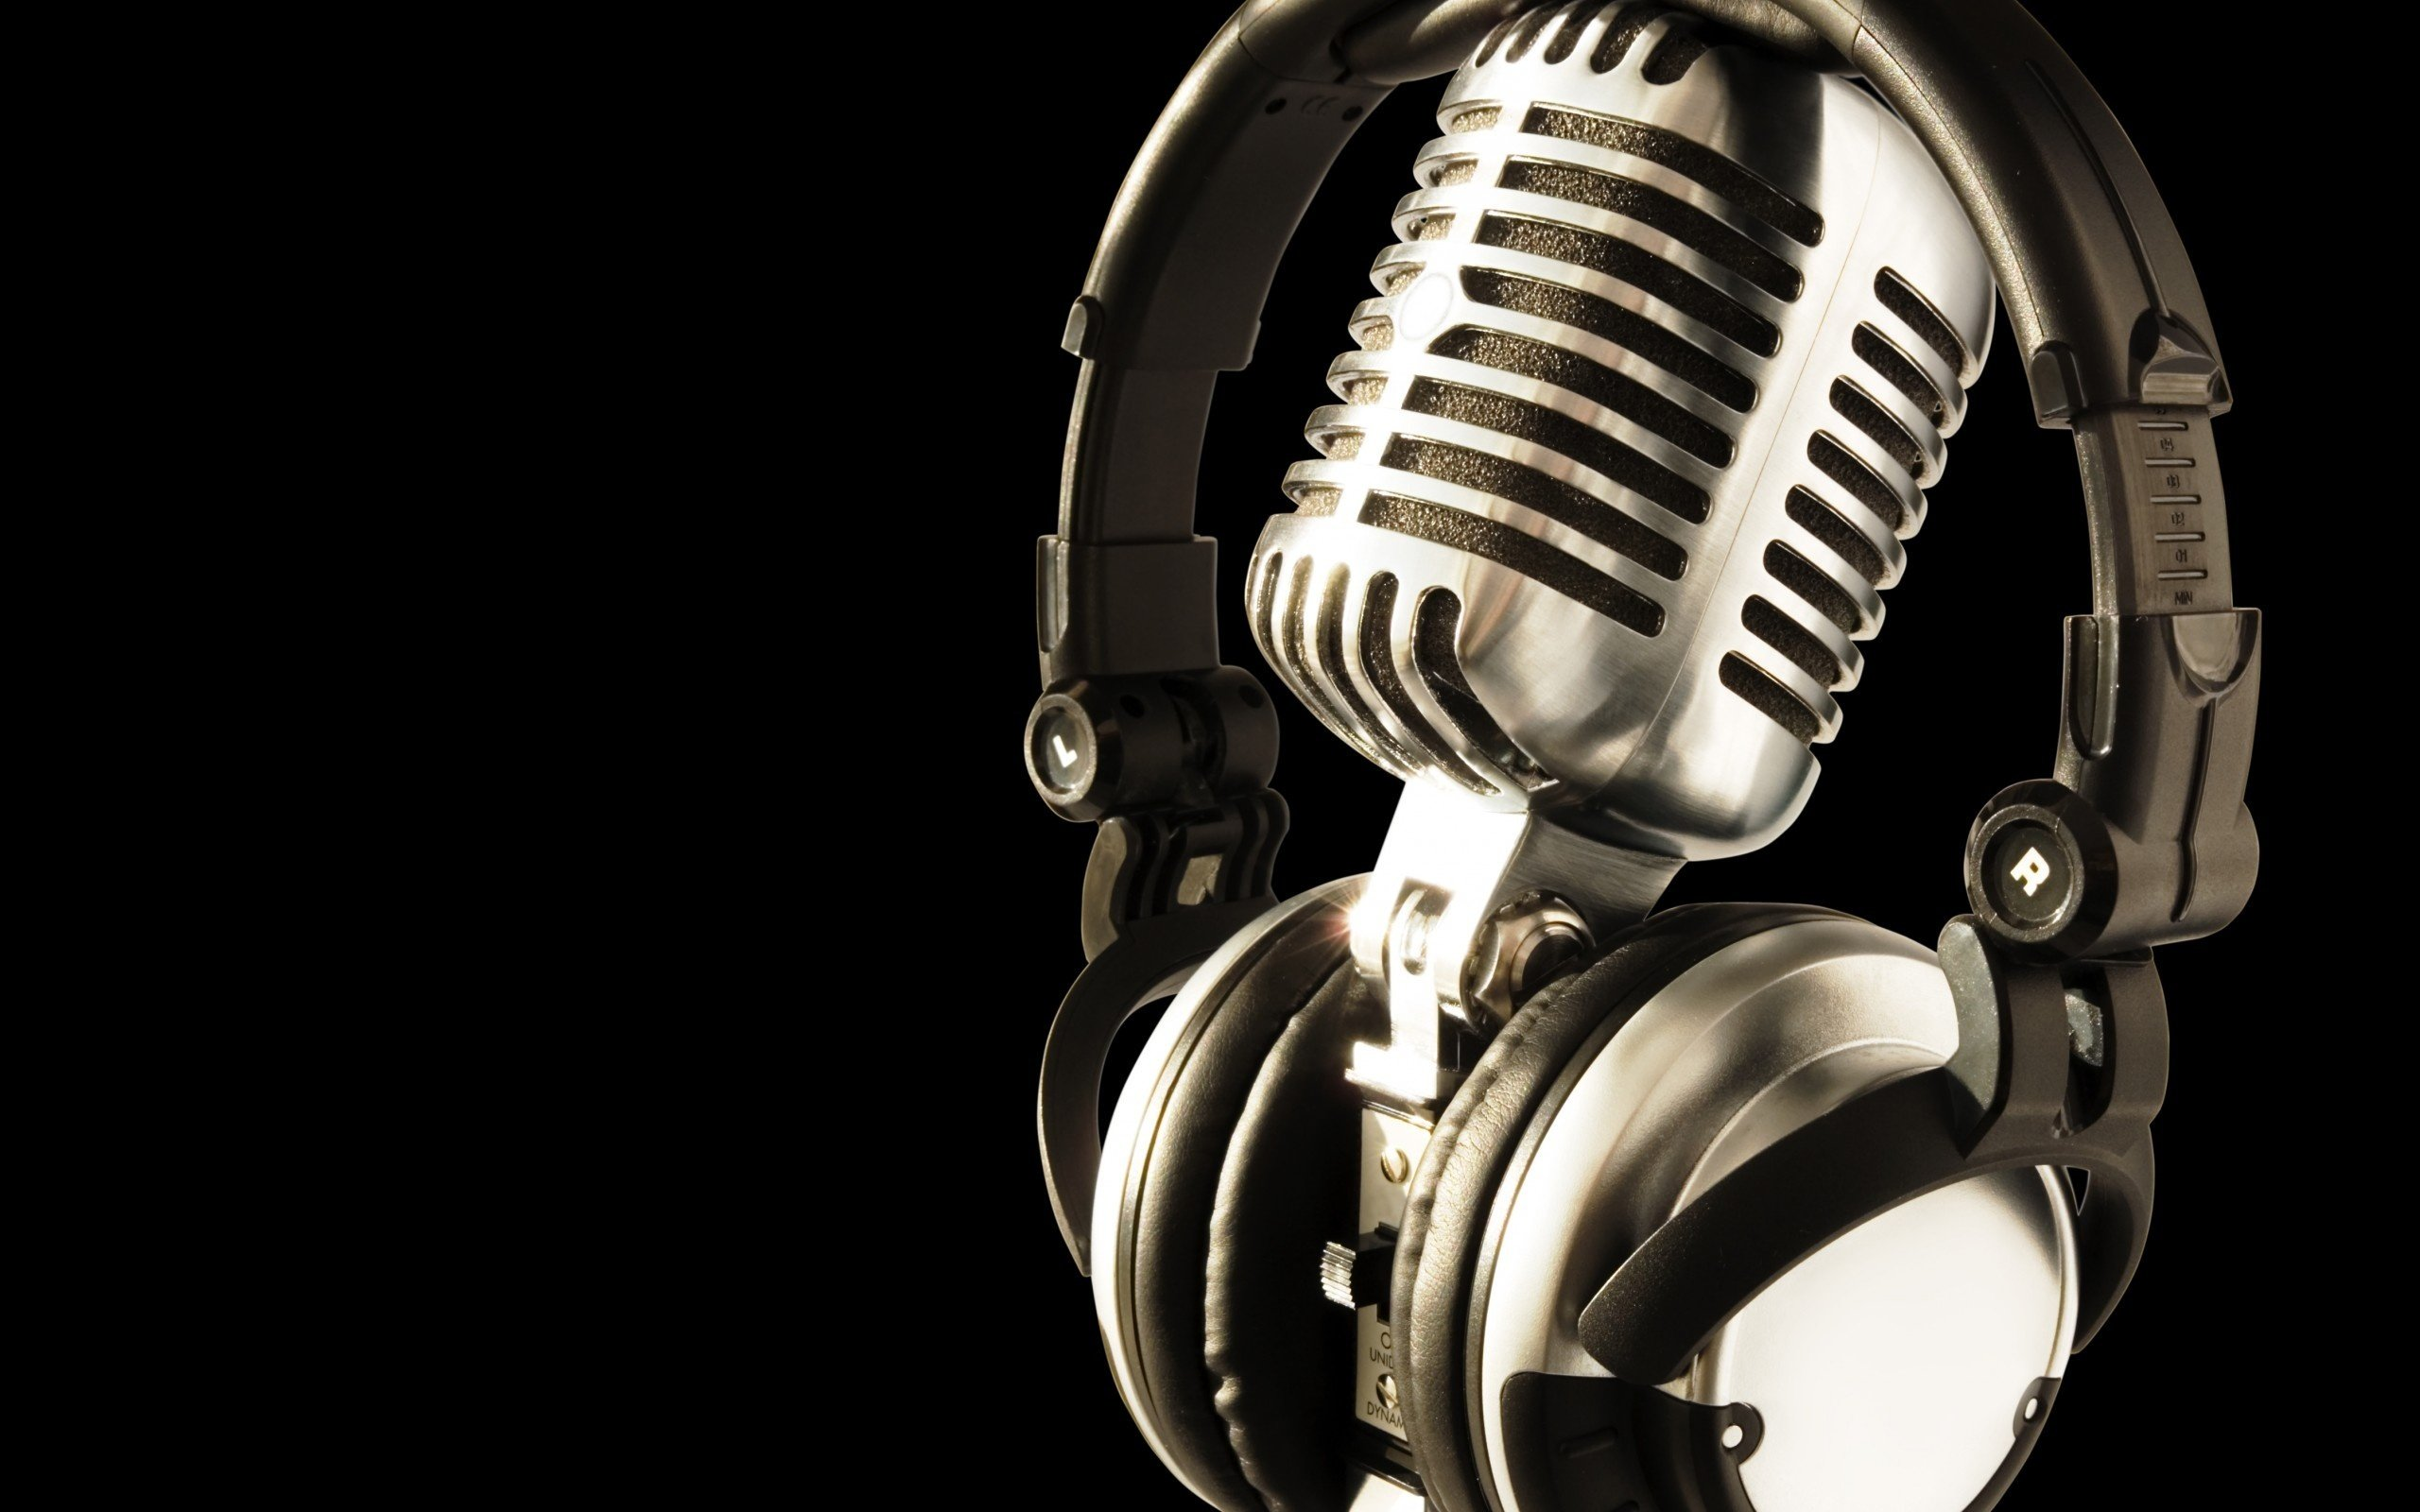 Retro microphone wallpaper Wallpaper Wide HD 2560x1600